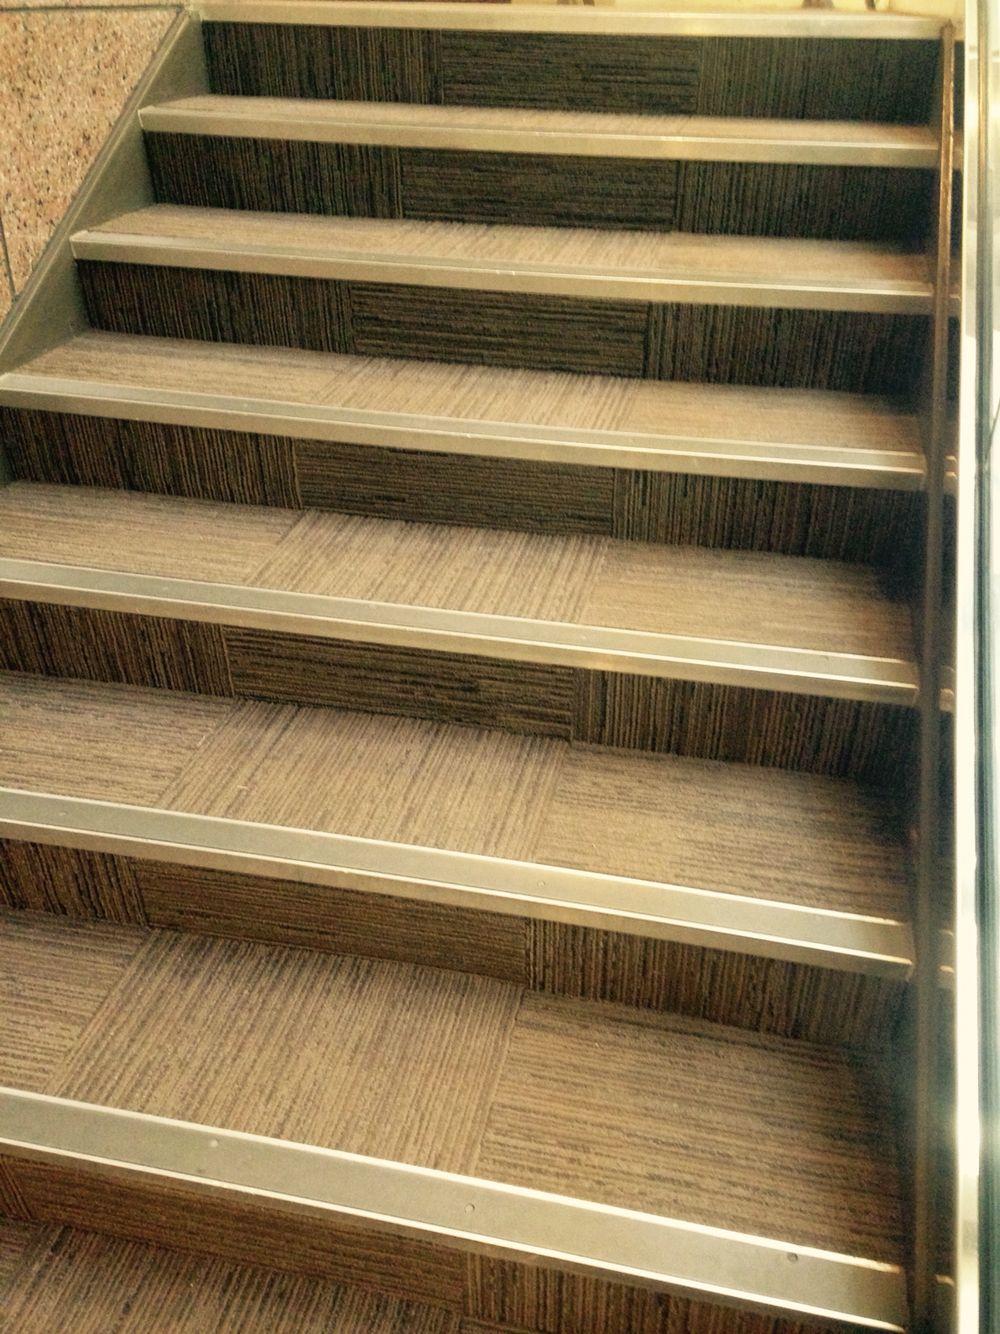 Interface Carpet Tile With Stair Nosing At Our Headquarters In | Carpet Stair Nosing Metal | Anti Slip Stair | Laminate Flooring | Edge Trim | Edging Nosings | Inserts